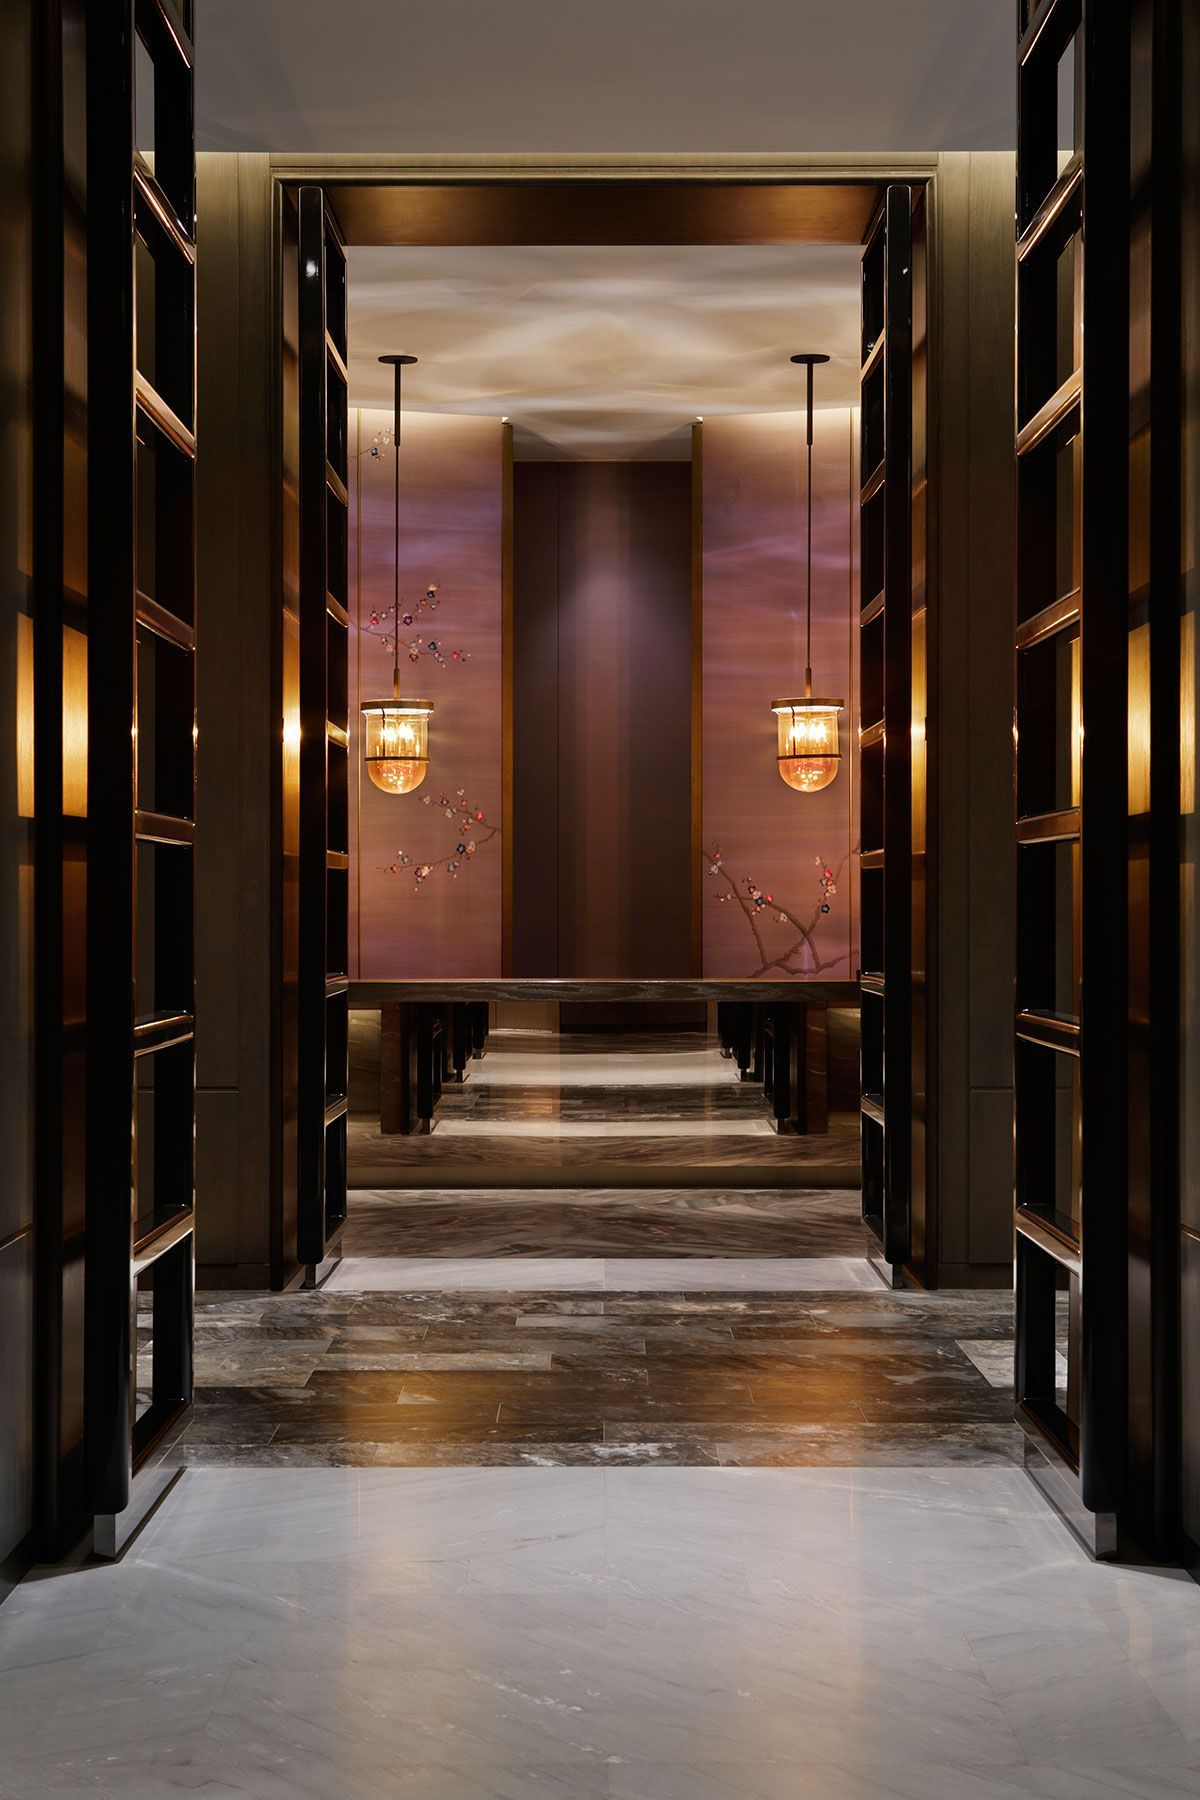 Yabu pushelberg waldorf astoria beijing interior hotel for Design hotel waldorf